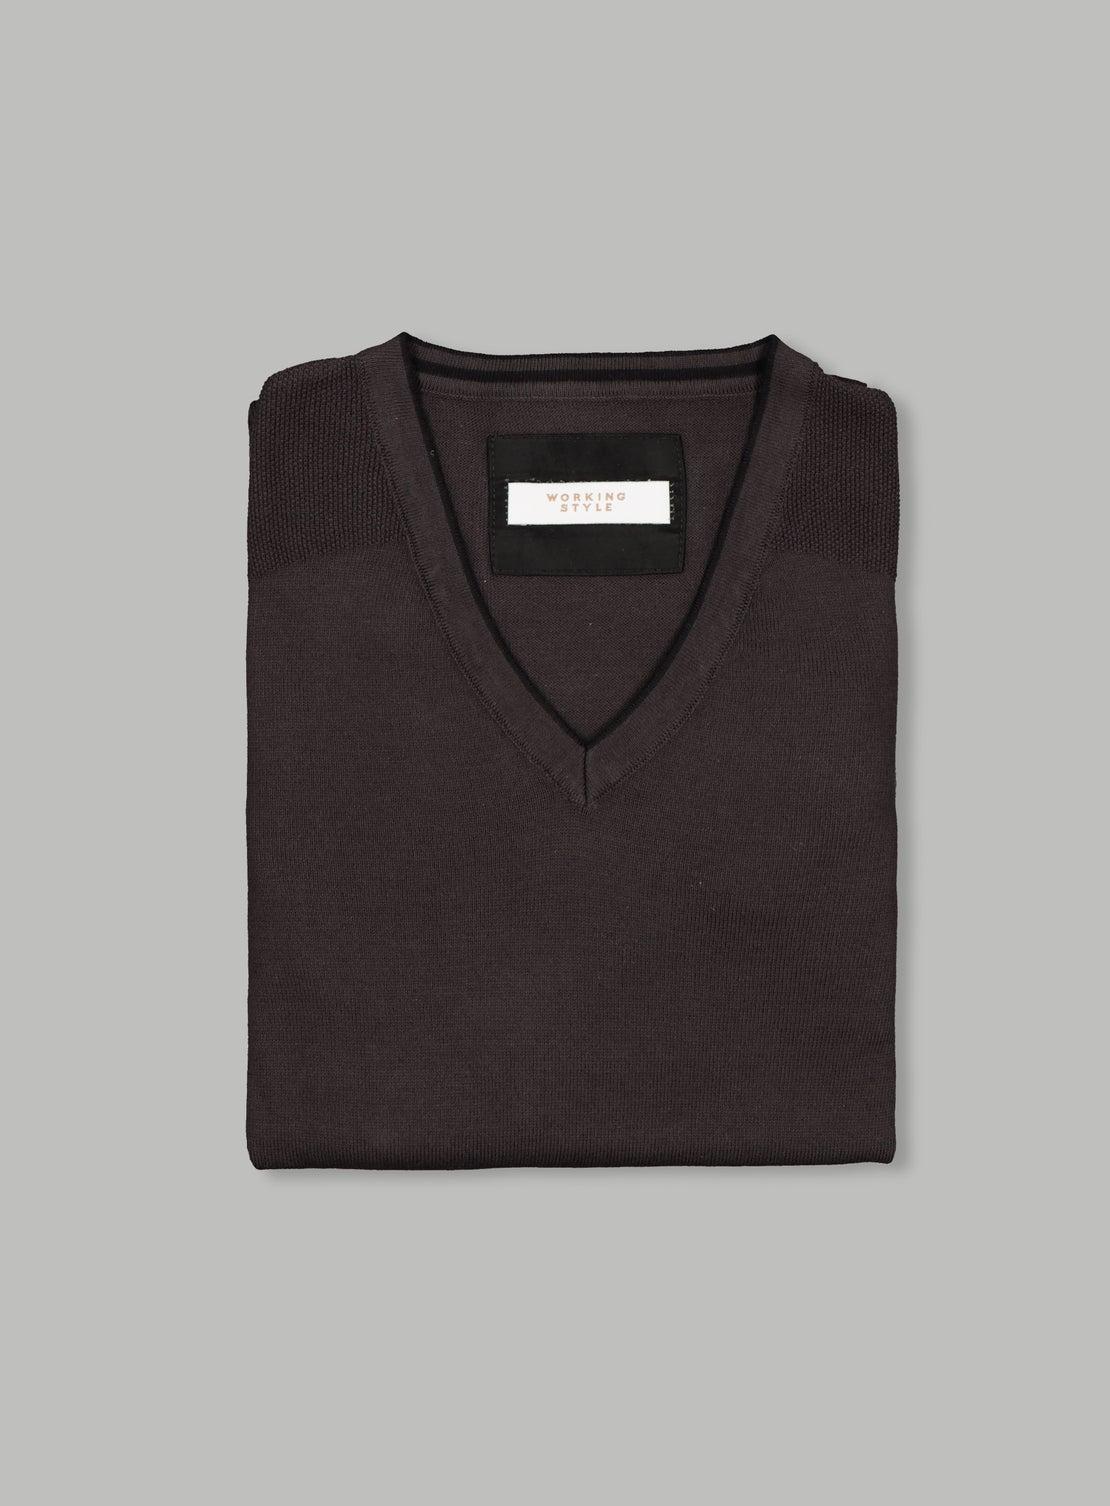 Charcoal Cotton V Neck